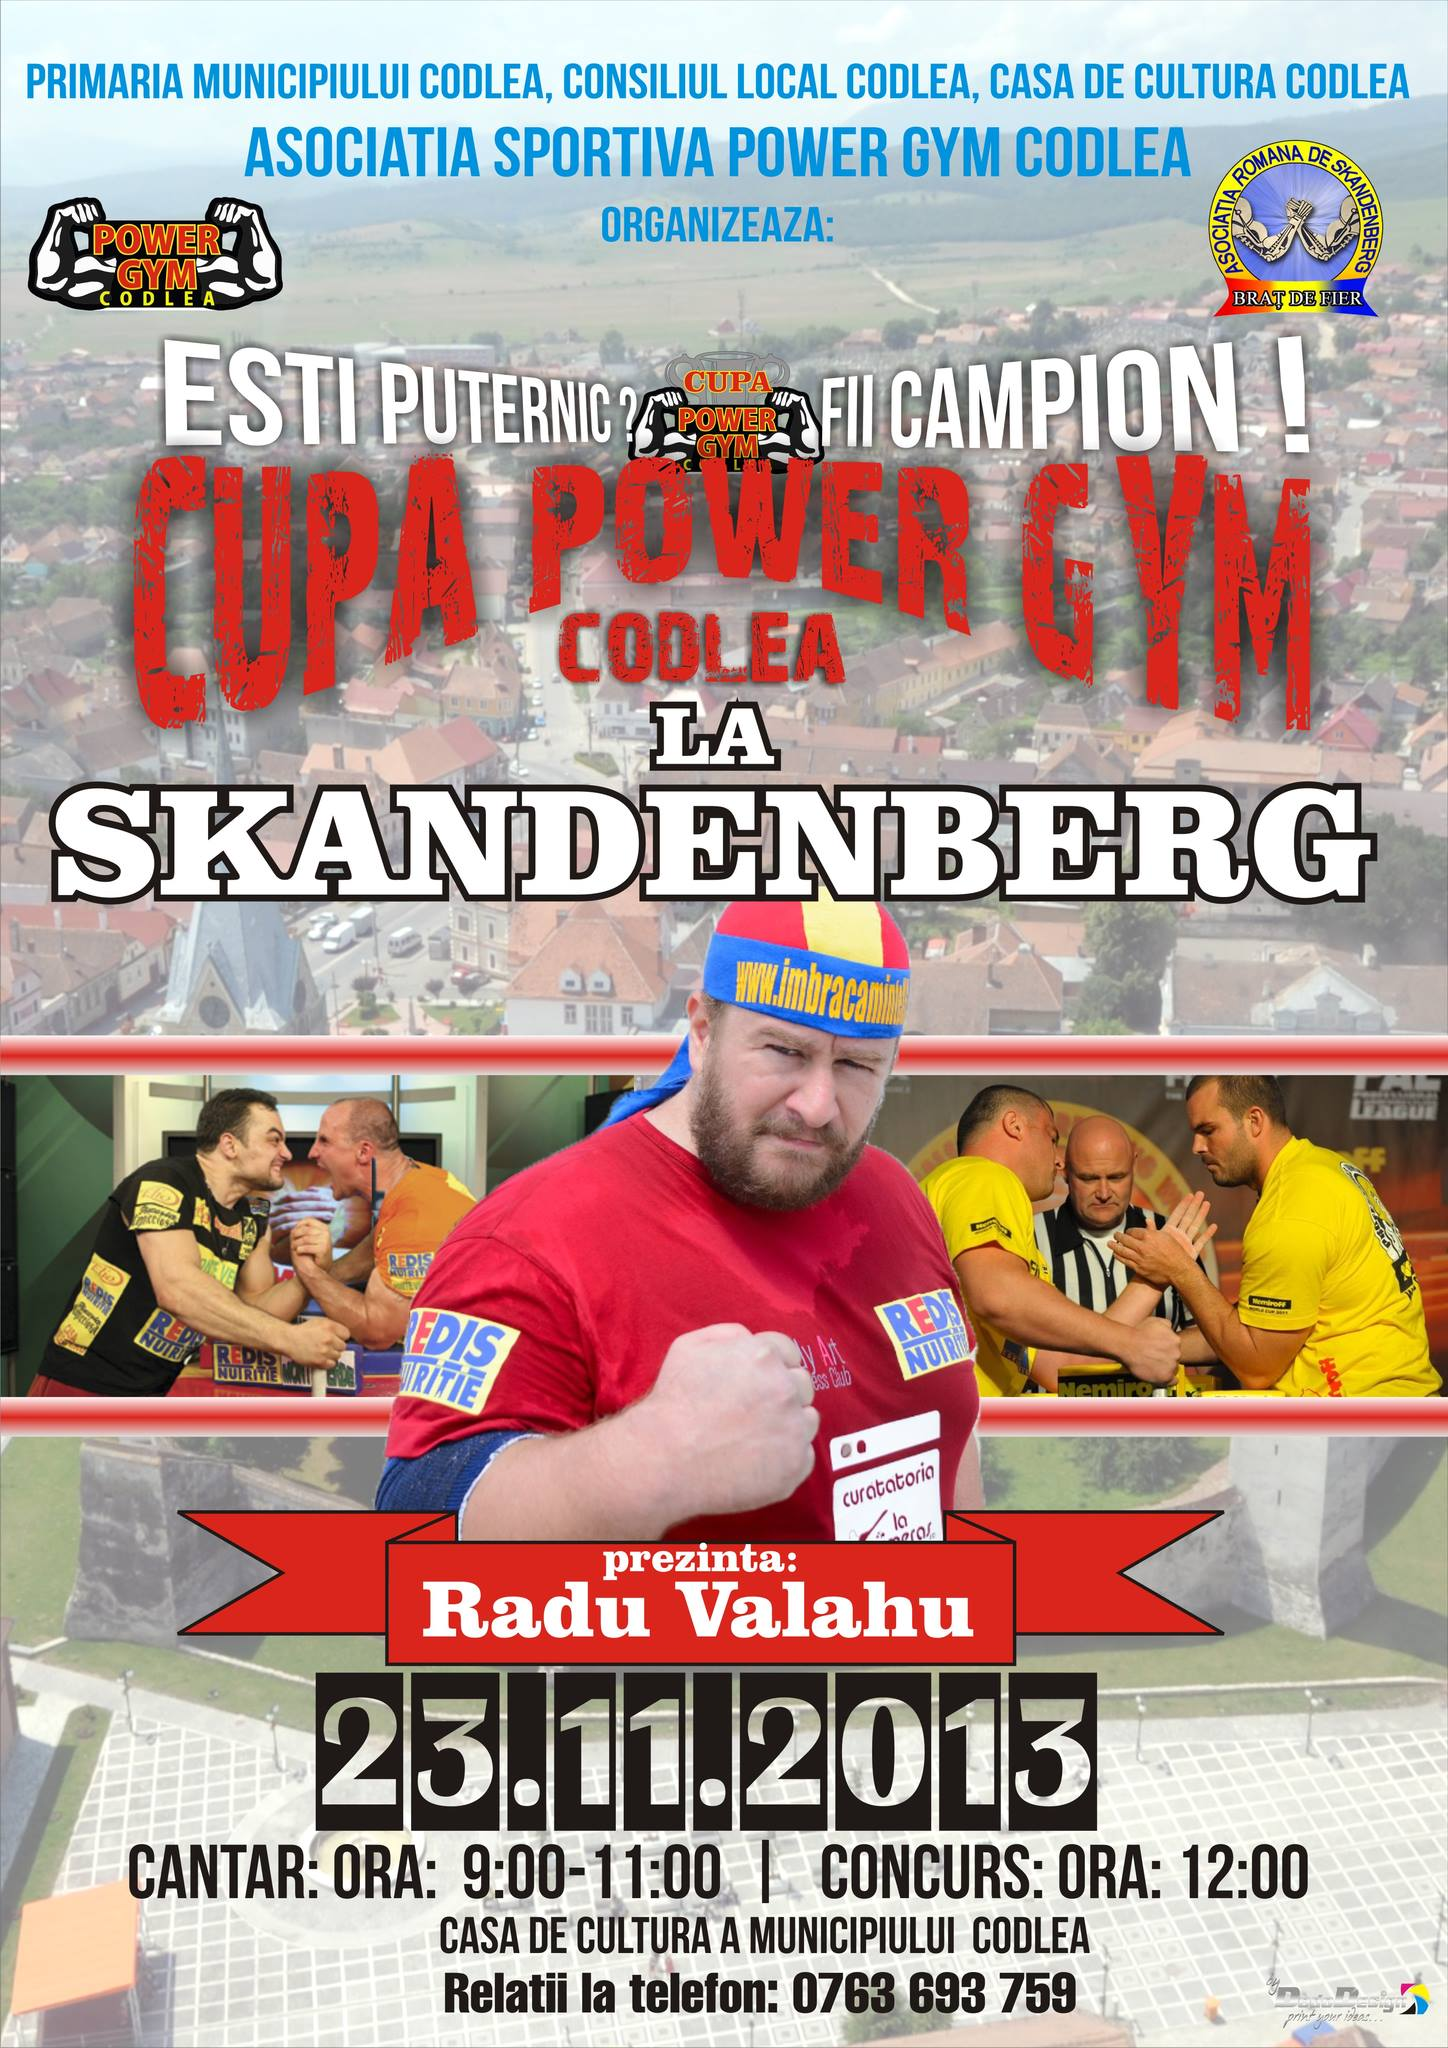 Skandenberg